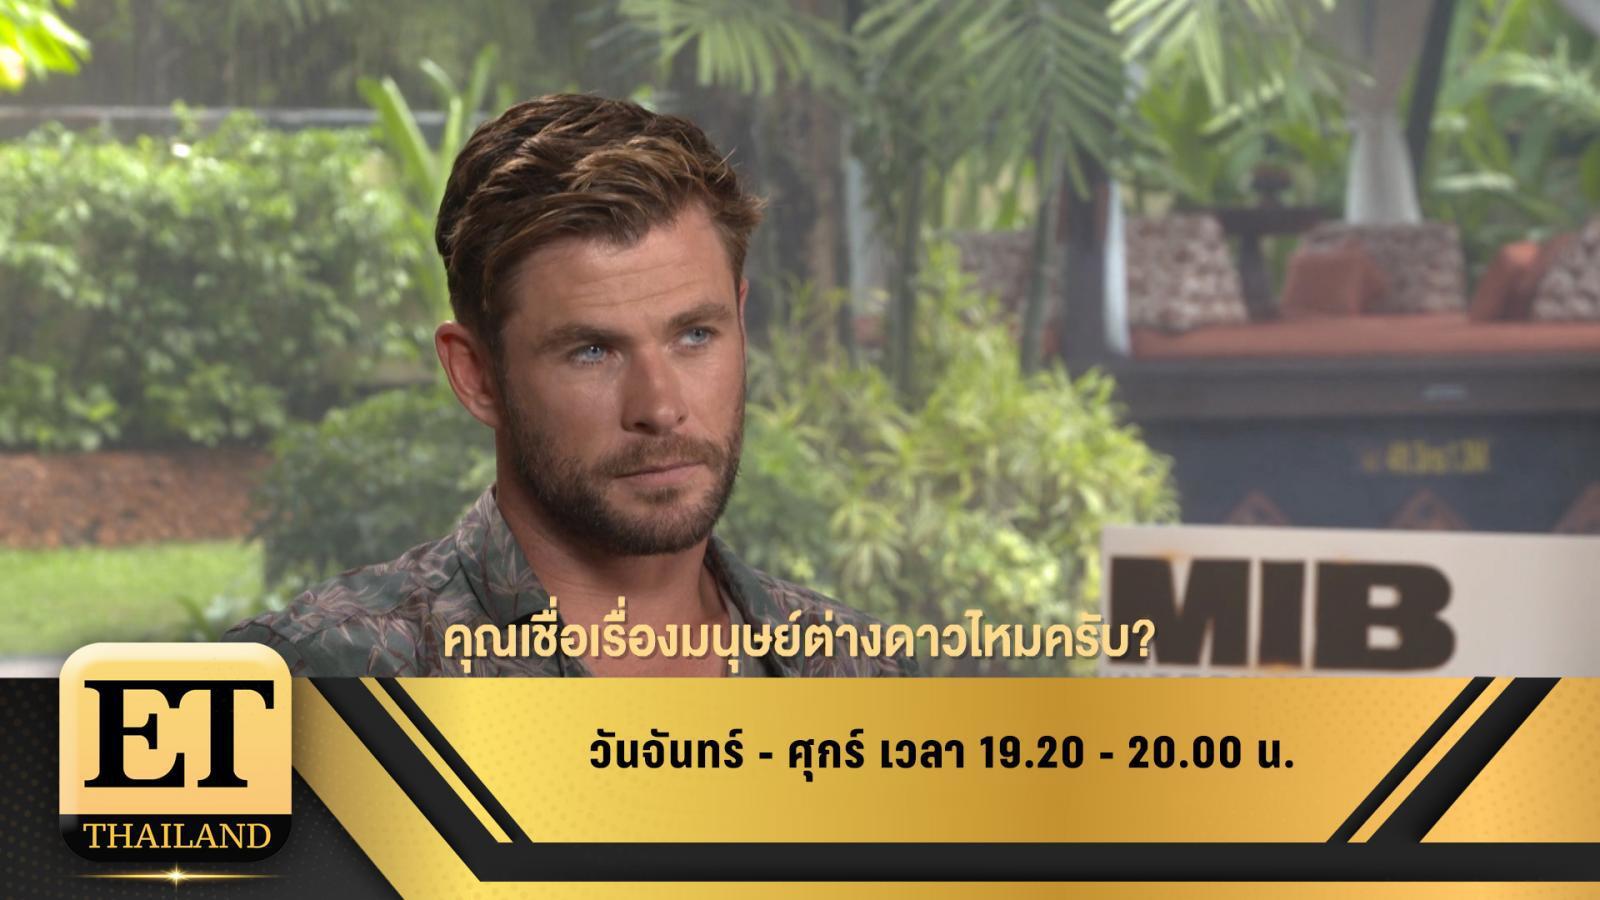 ET Thailand 11 มิถุนายน 2562